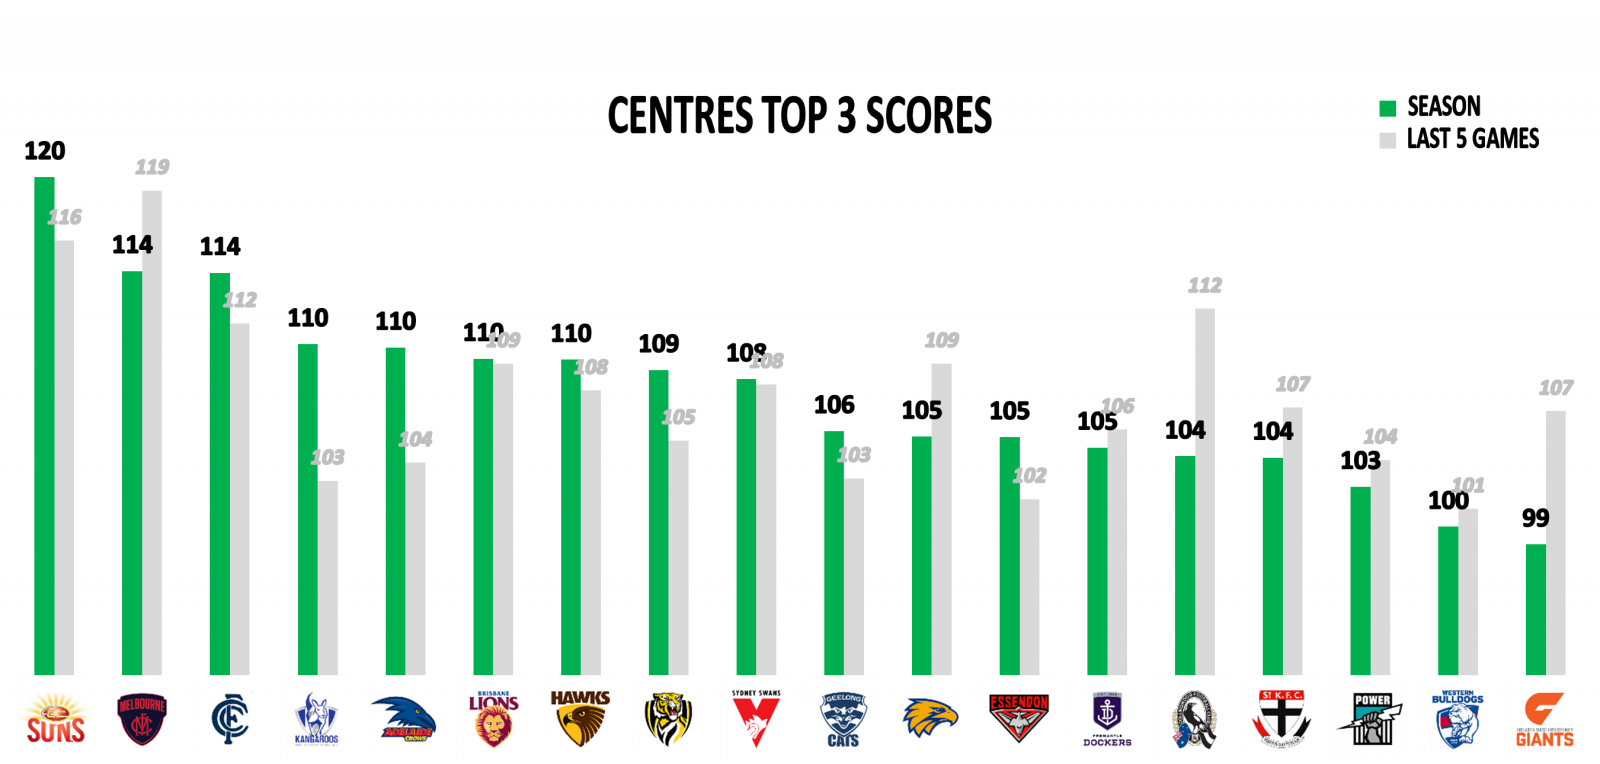 Points against centres